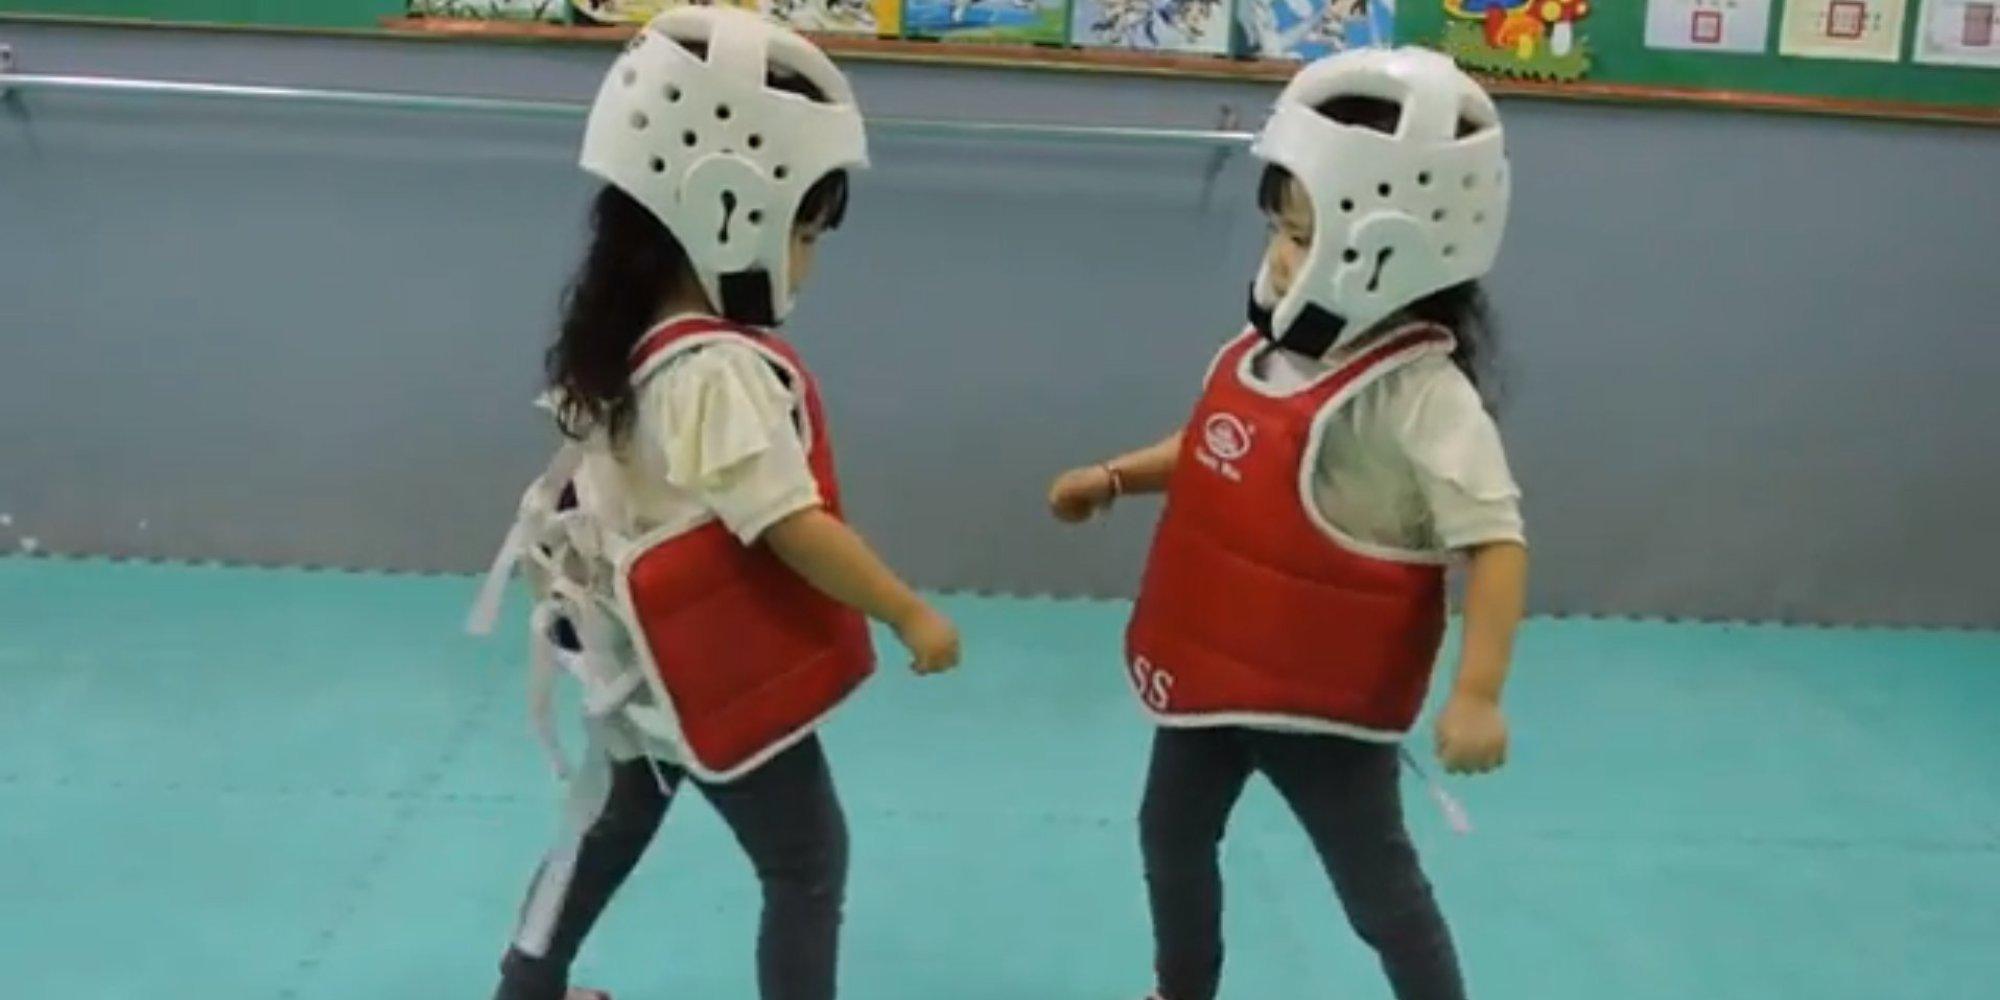 Taekwondo video